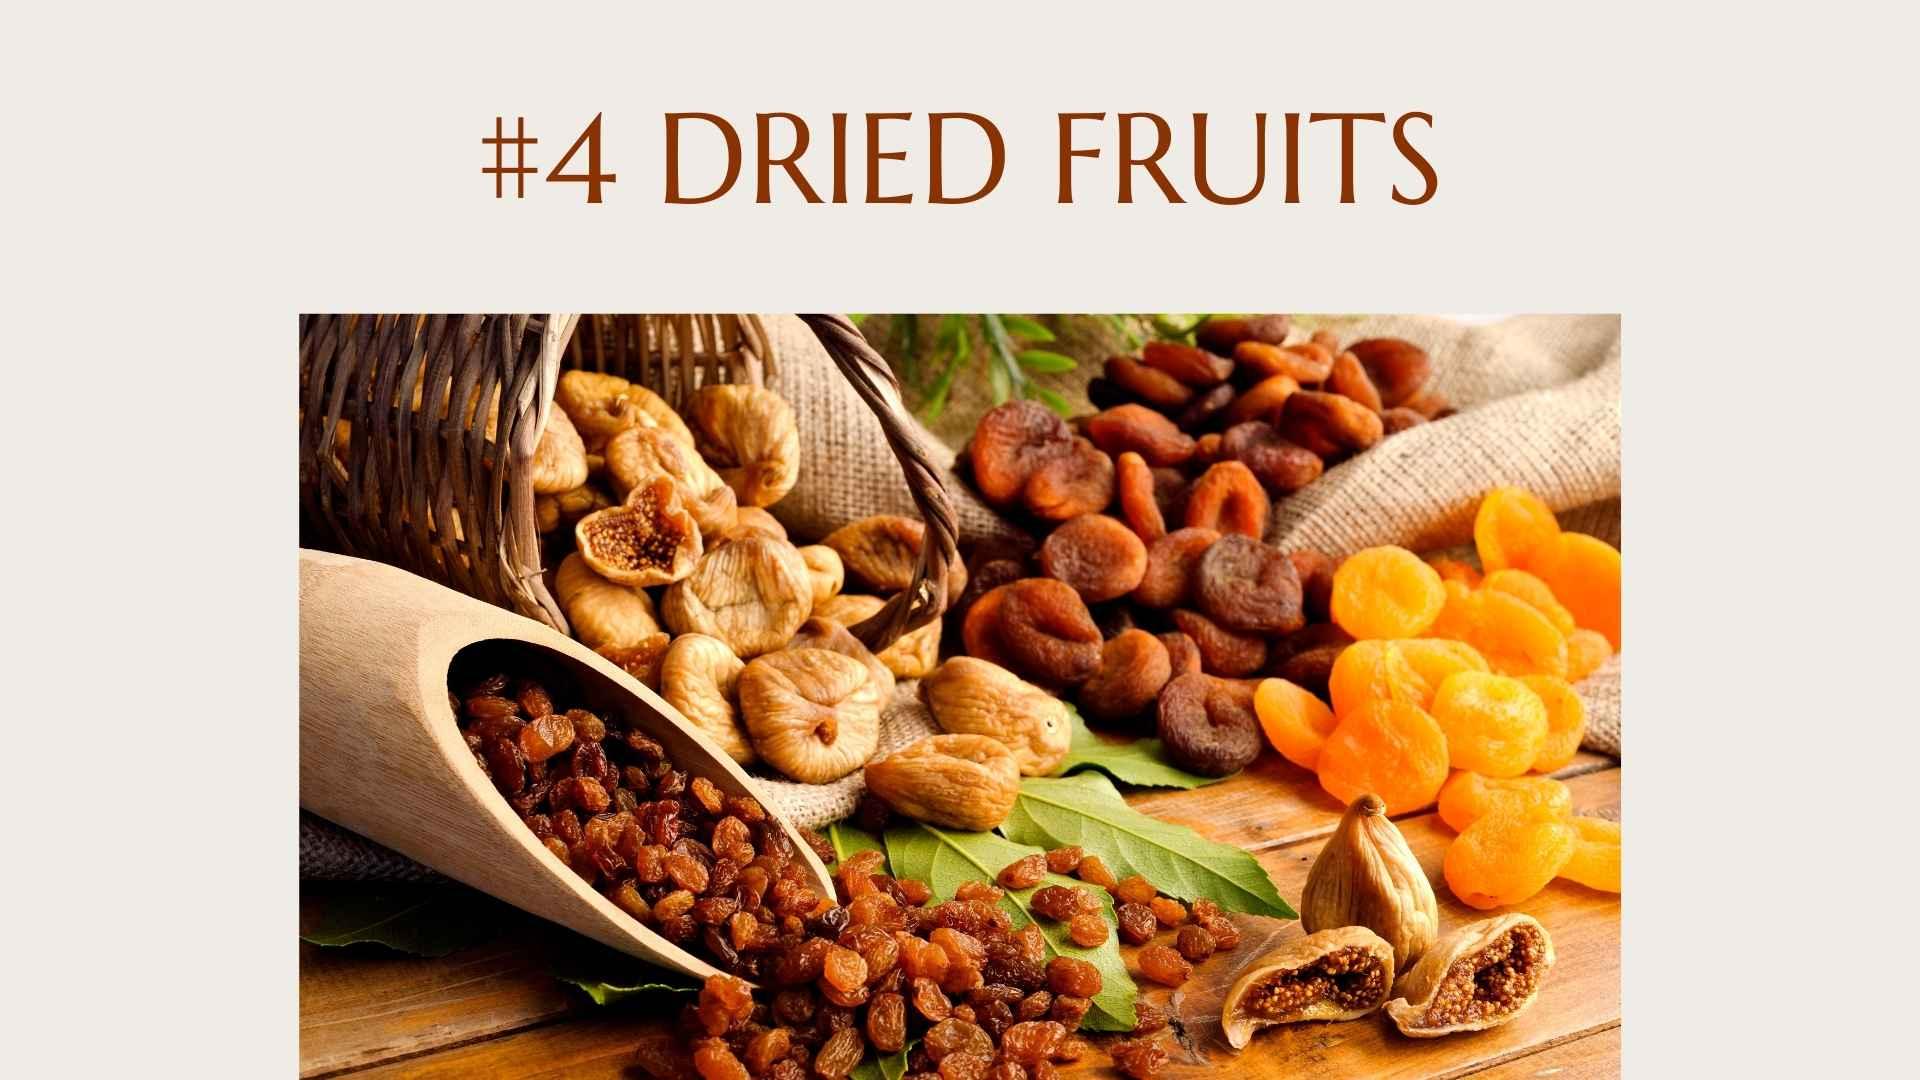 #4 dried fruits